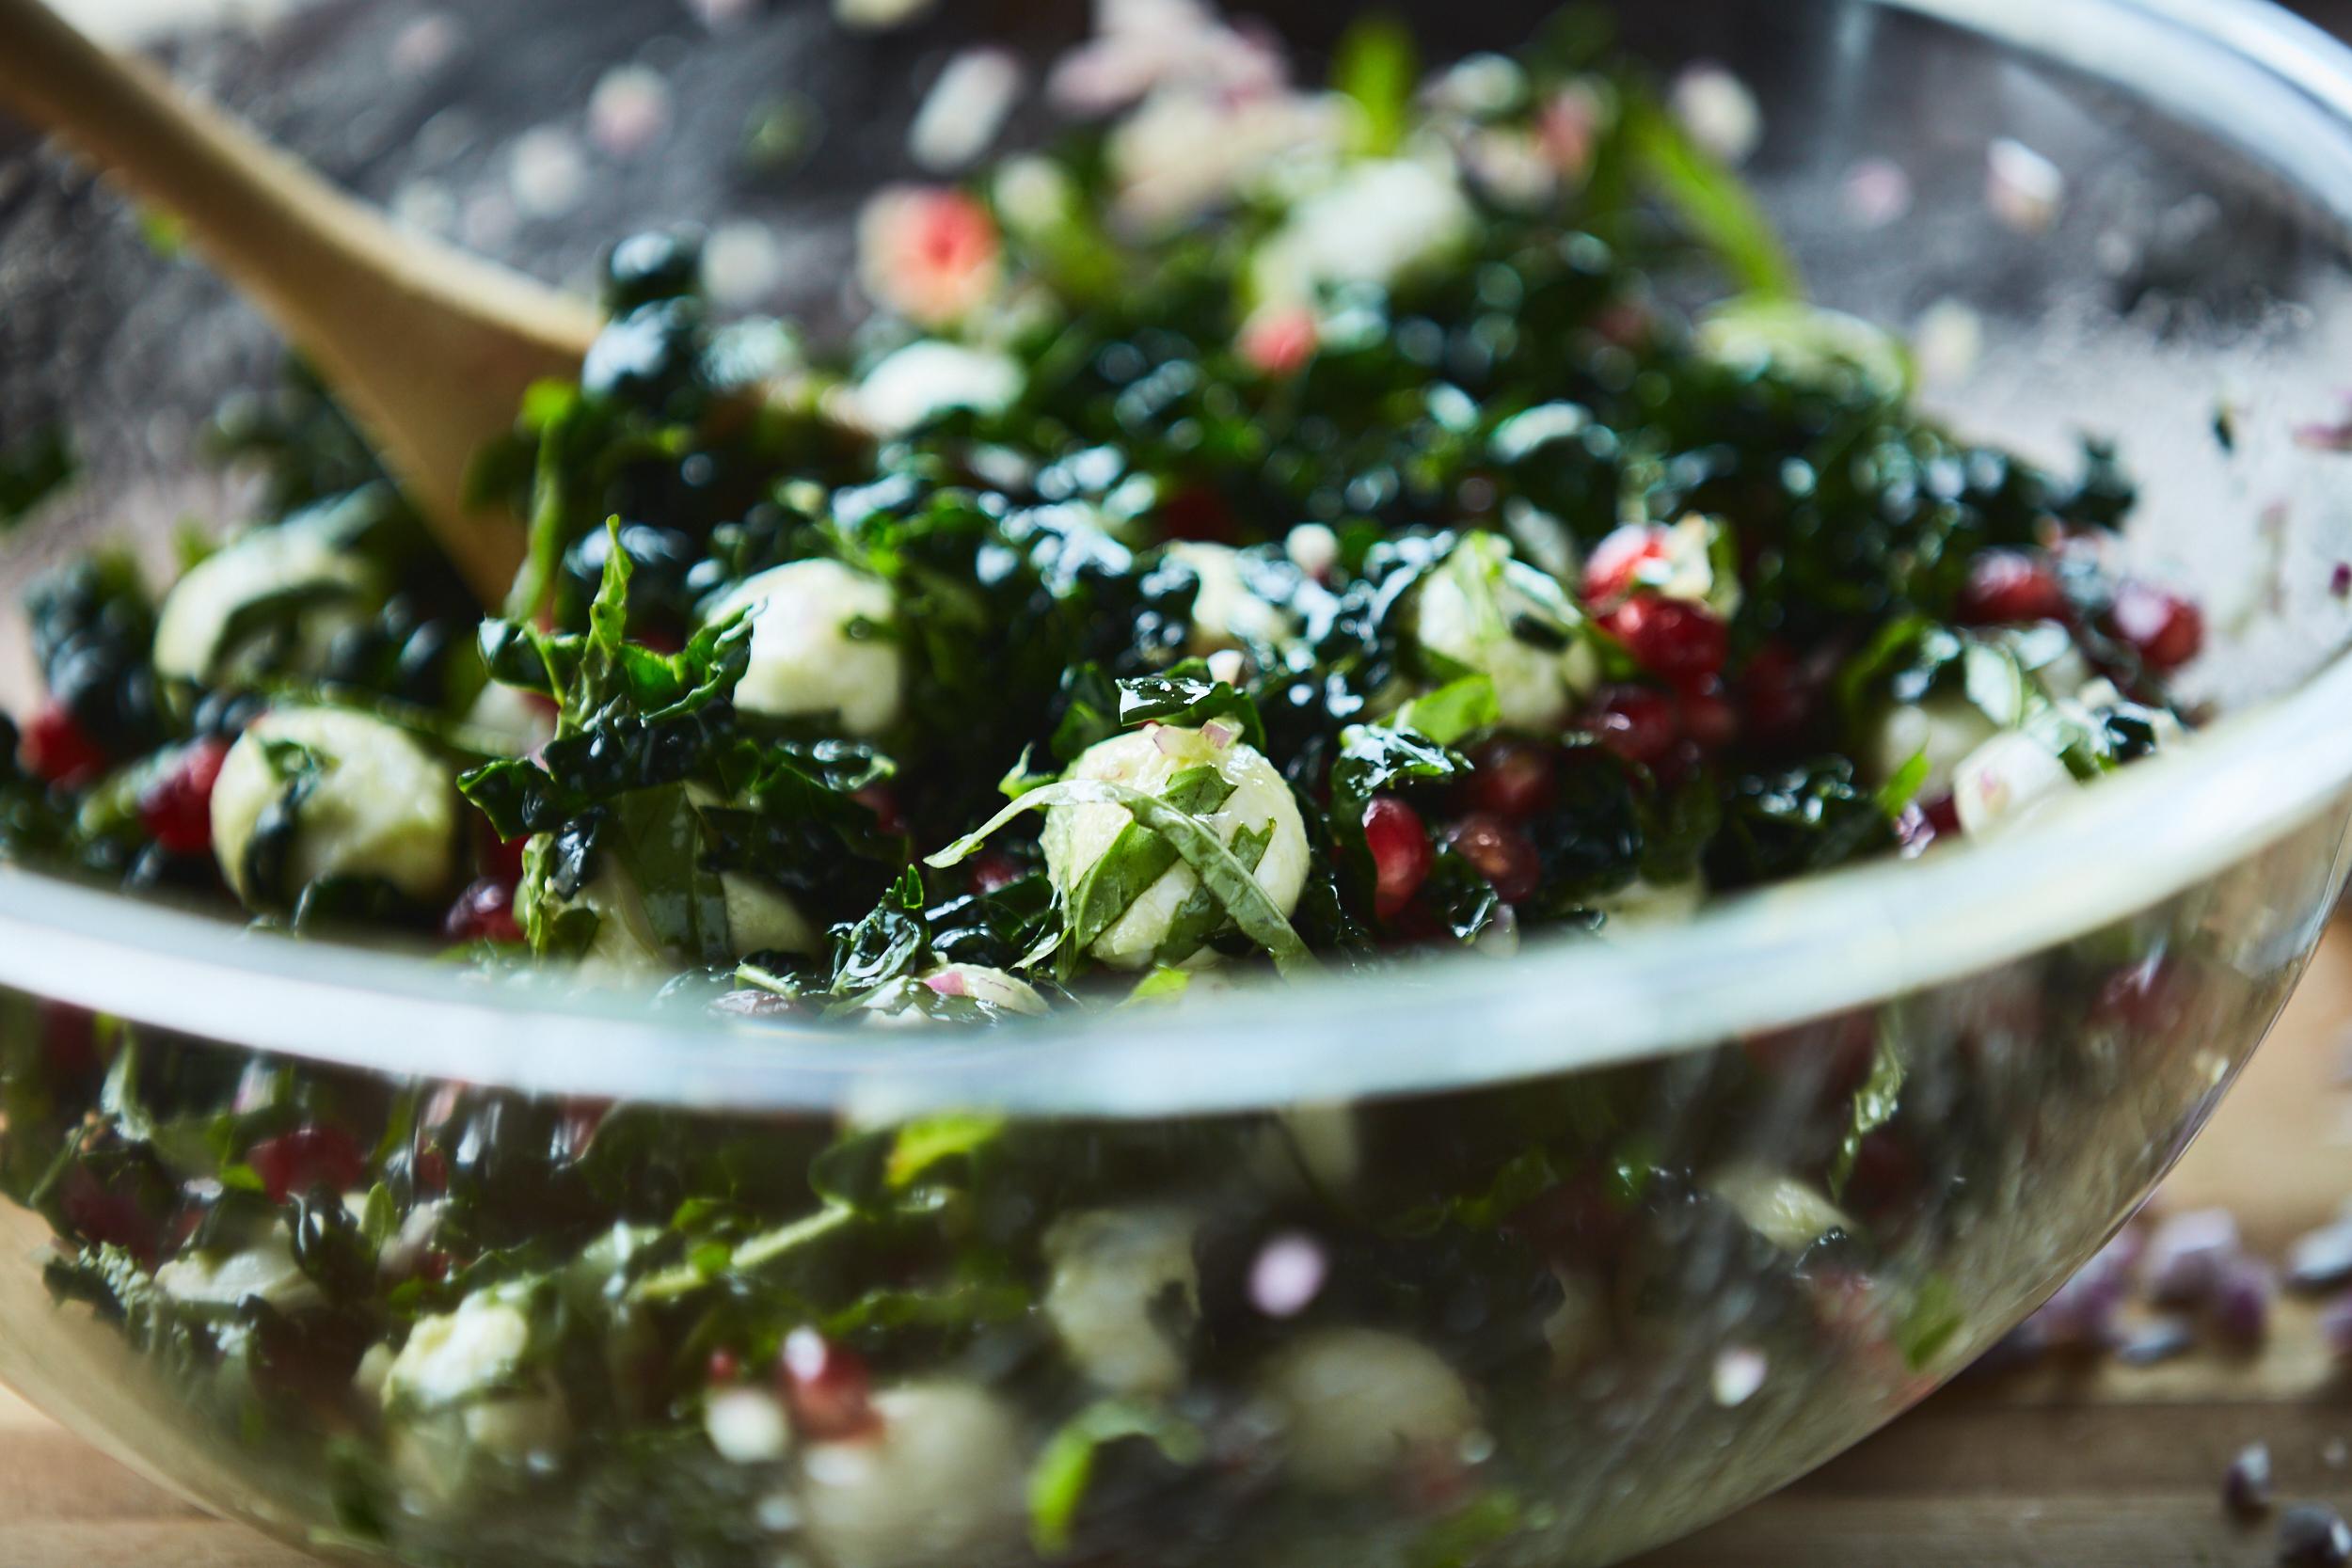 Mozzarella and Pomegranate Salad - Traveling Fork